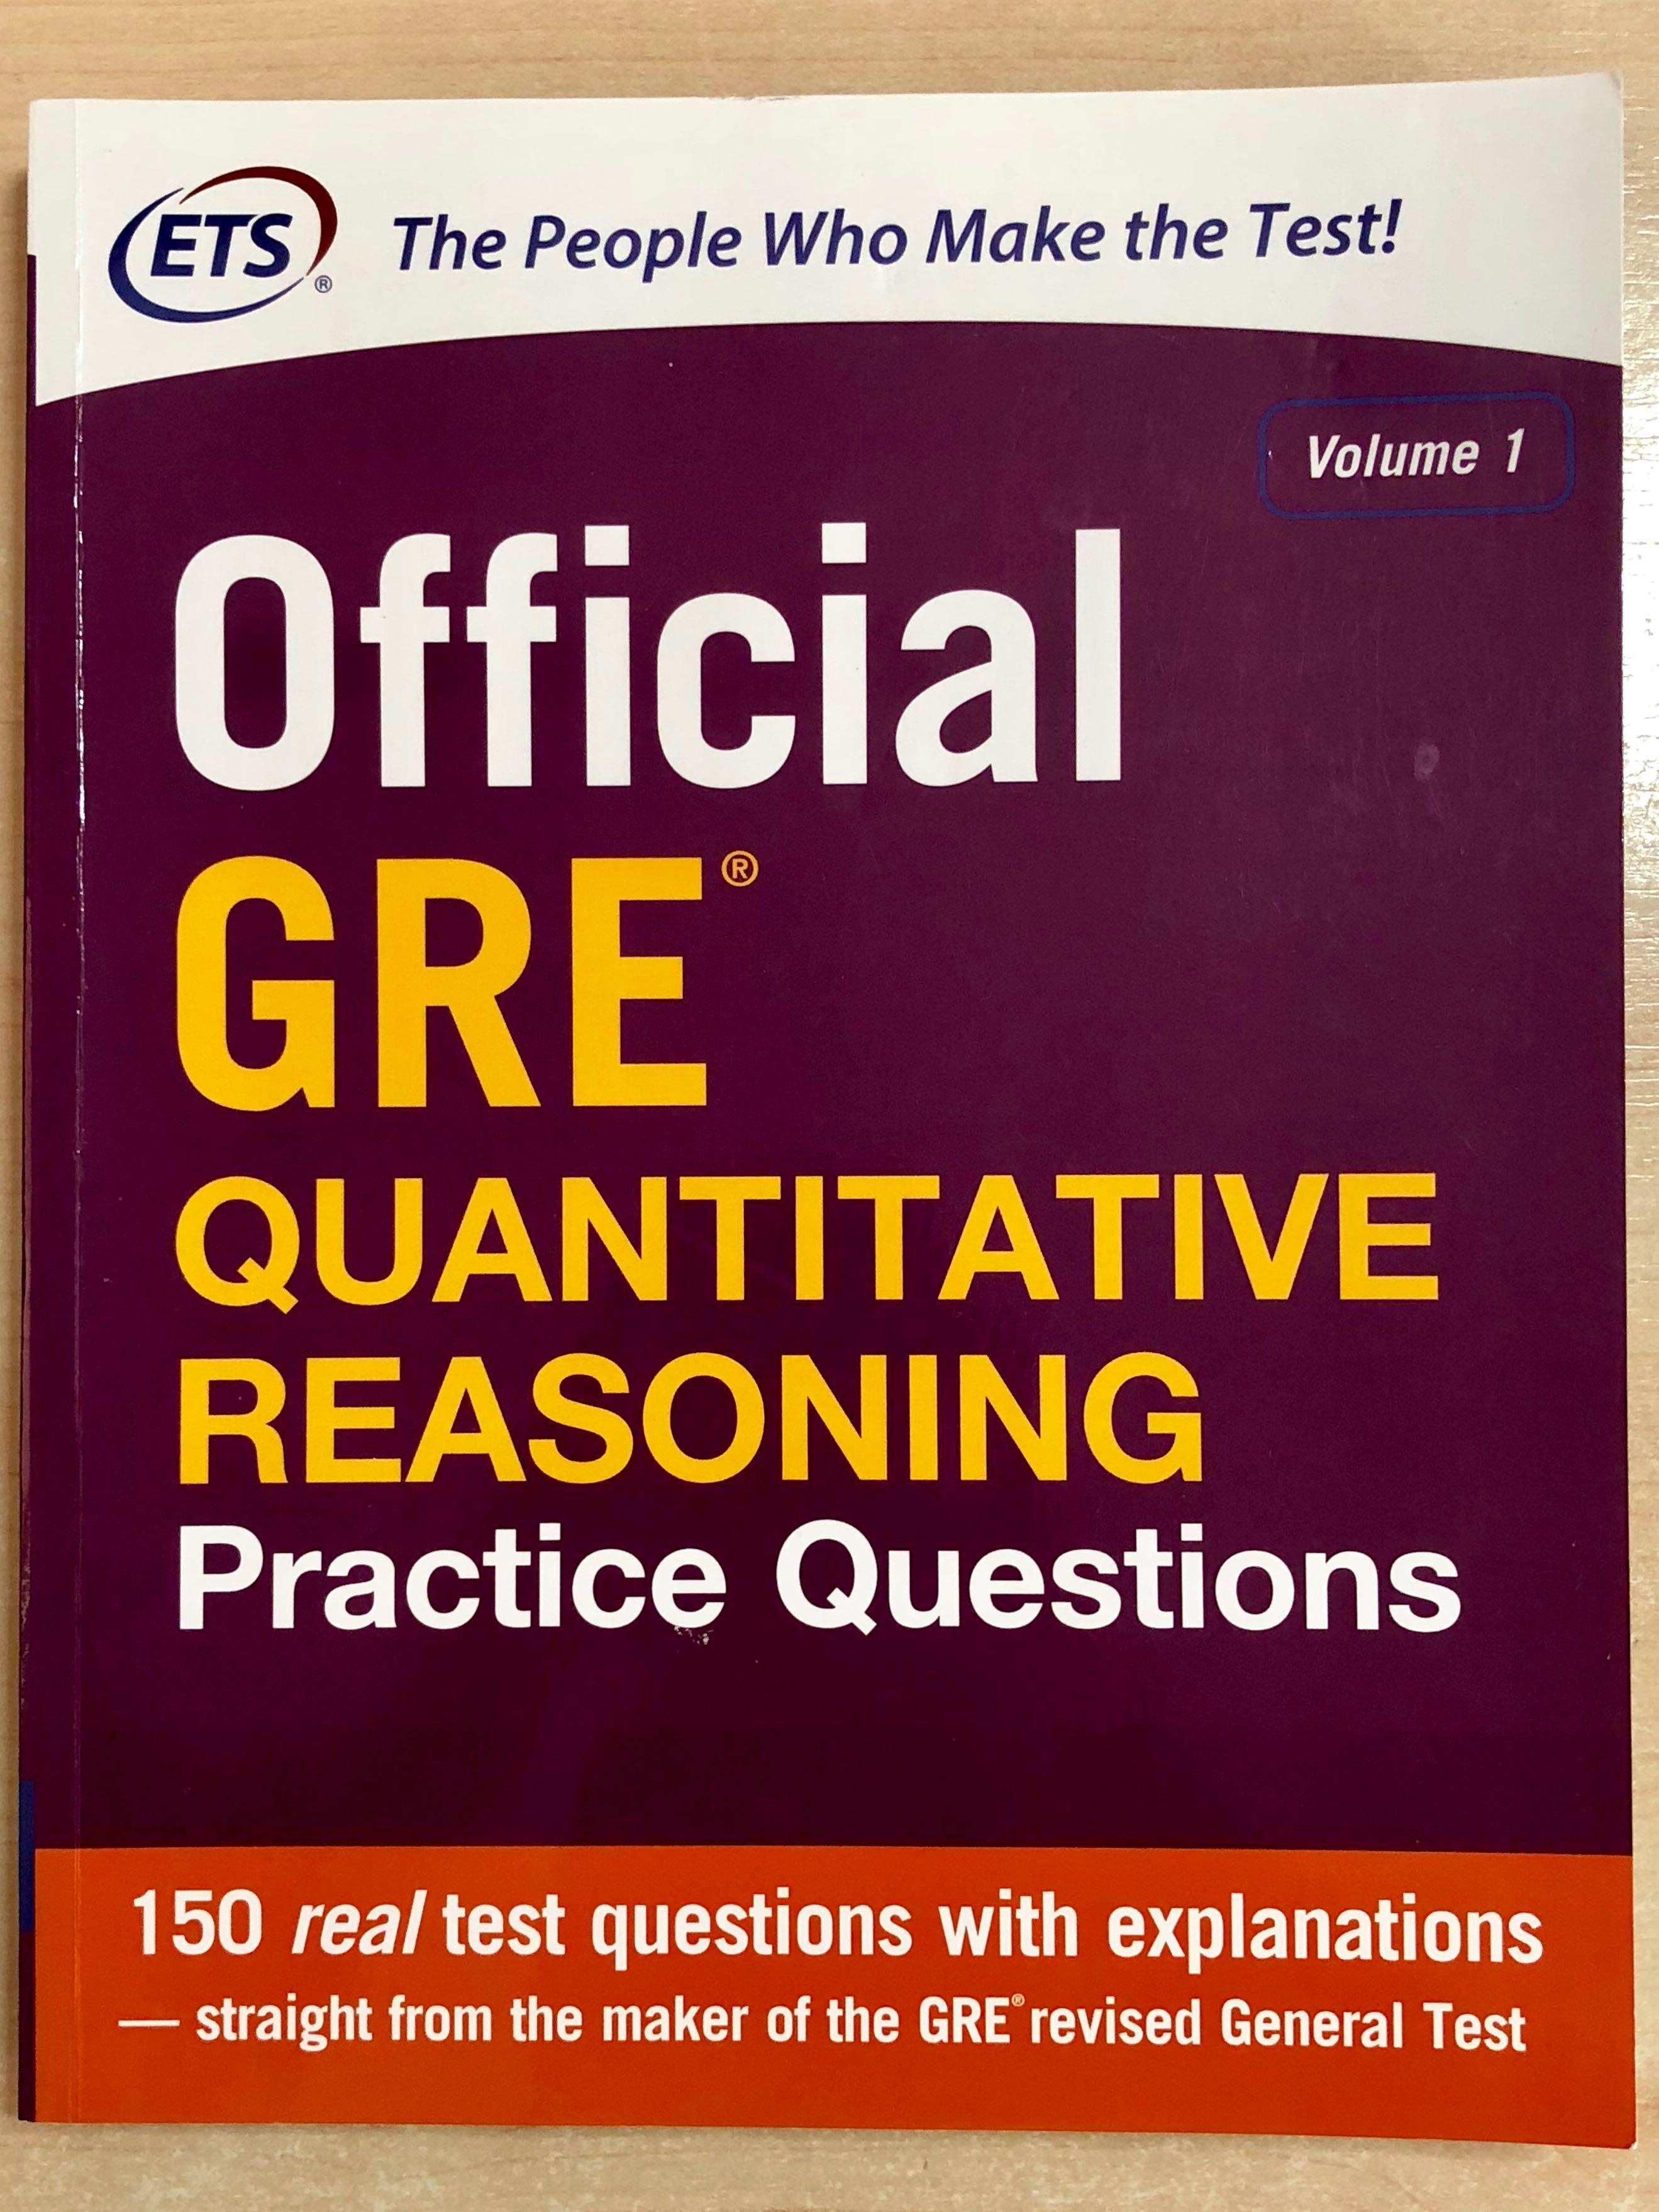 GRE Quantitative Reasoning Practice Questions